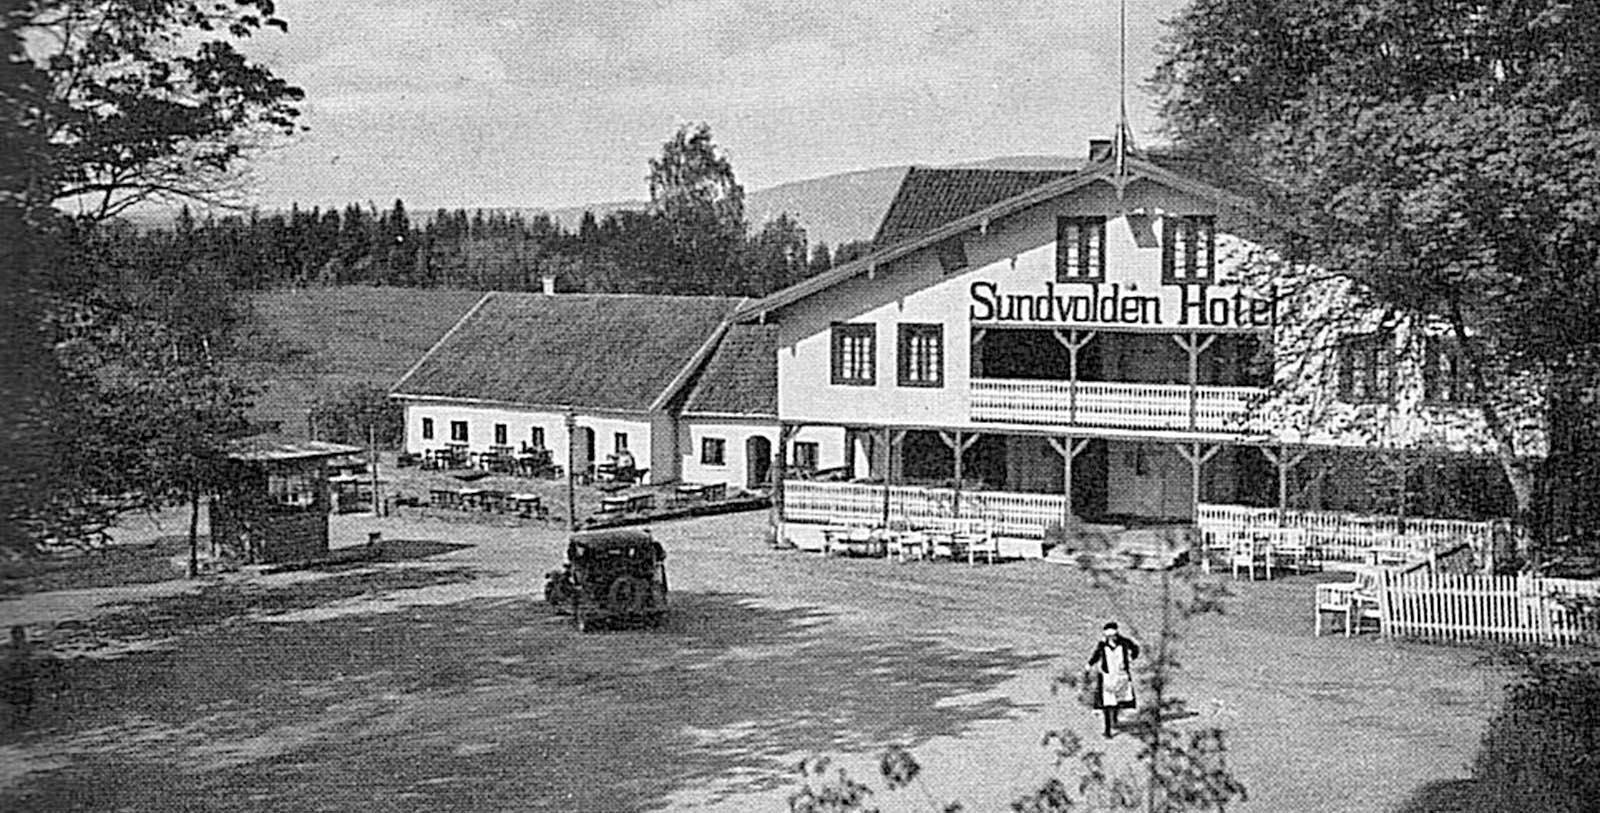 Historic Image of Hotel Exterior Sundvolden Hotel, 1648, Member of Historic Hotels Worldwide, in Krokkleiva, Norway, Discover